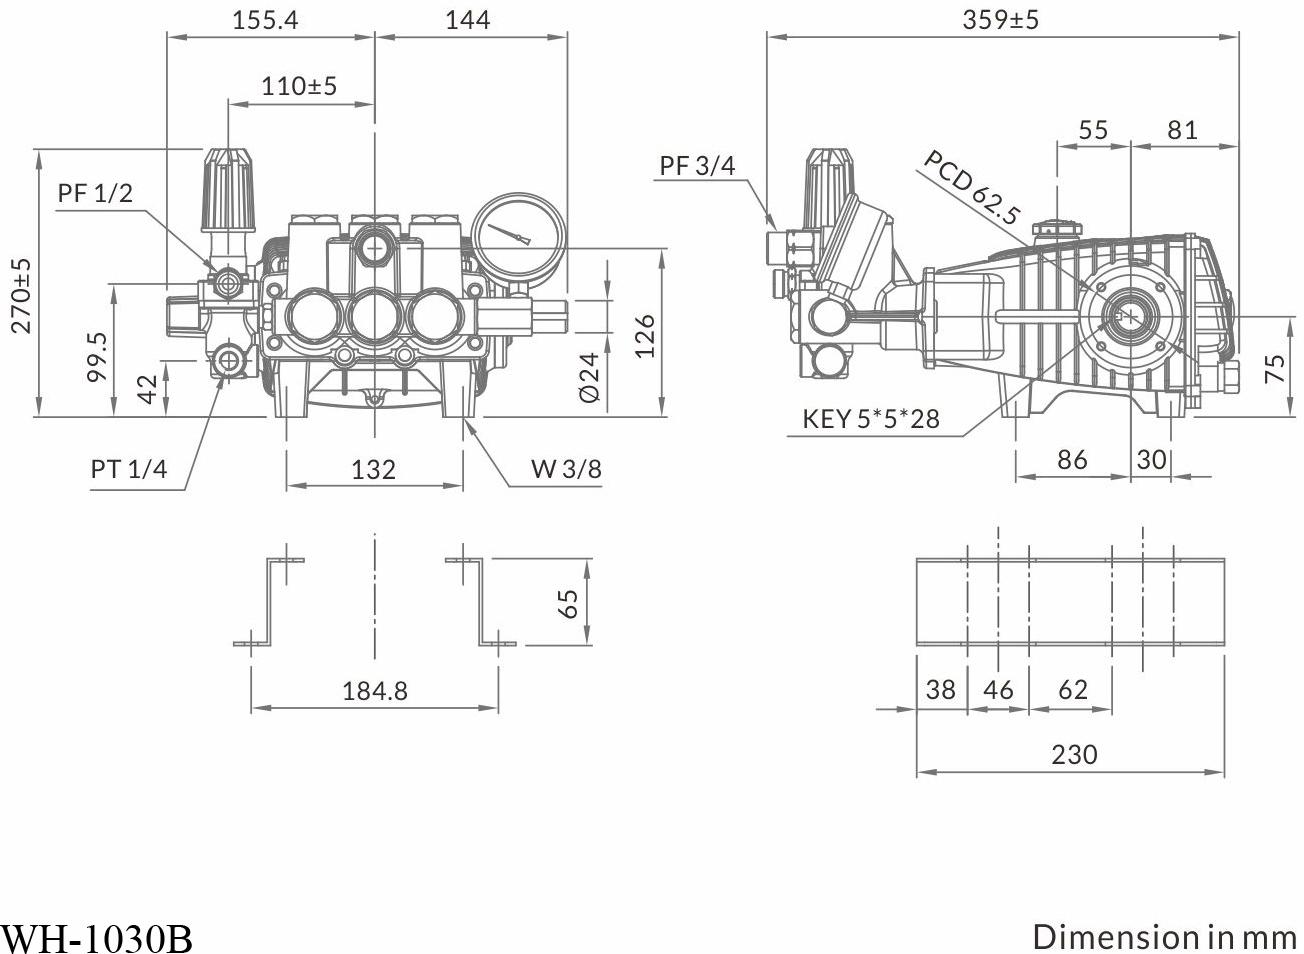 proimages/product/HIGH_PRESSURE_PUMP/Dimension/WH-1030B外觀尺寸圖.jpg